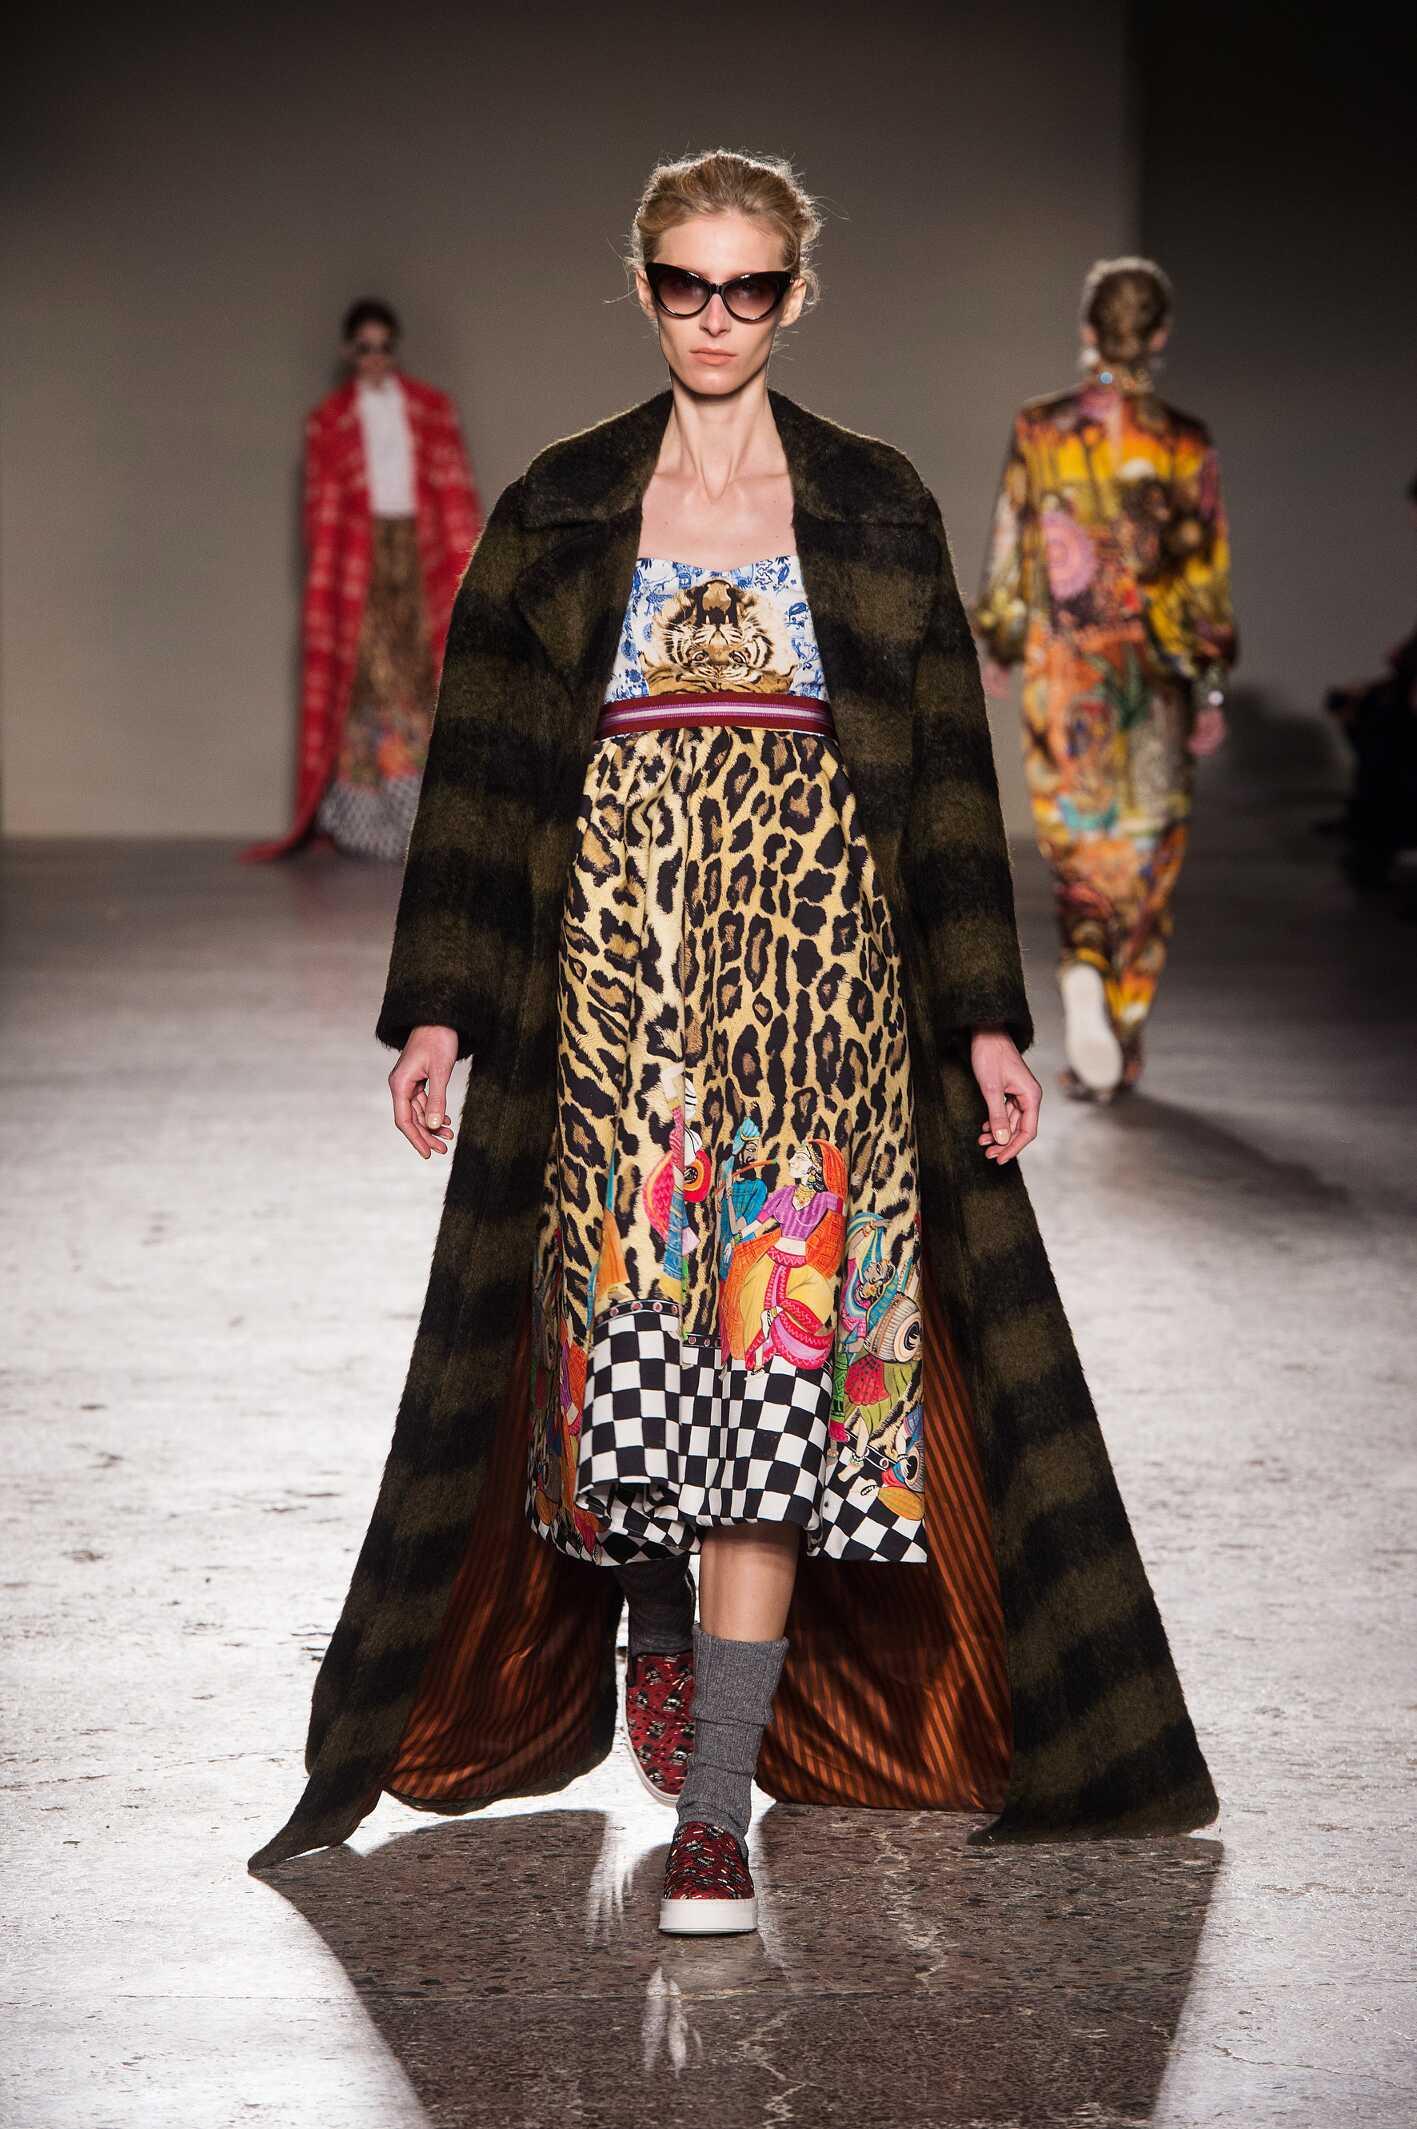 Catwalk Stella Jean Collection Fashion Show Winter 2015